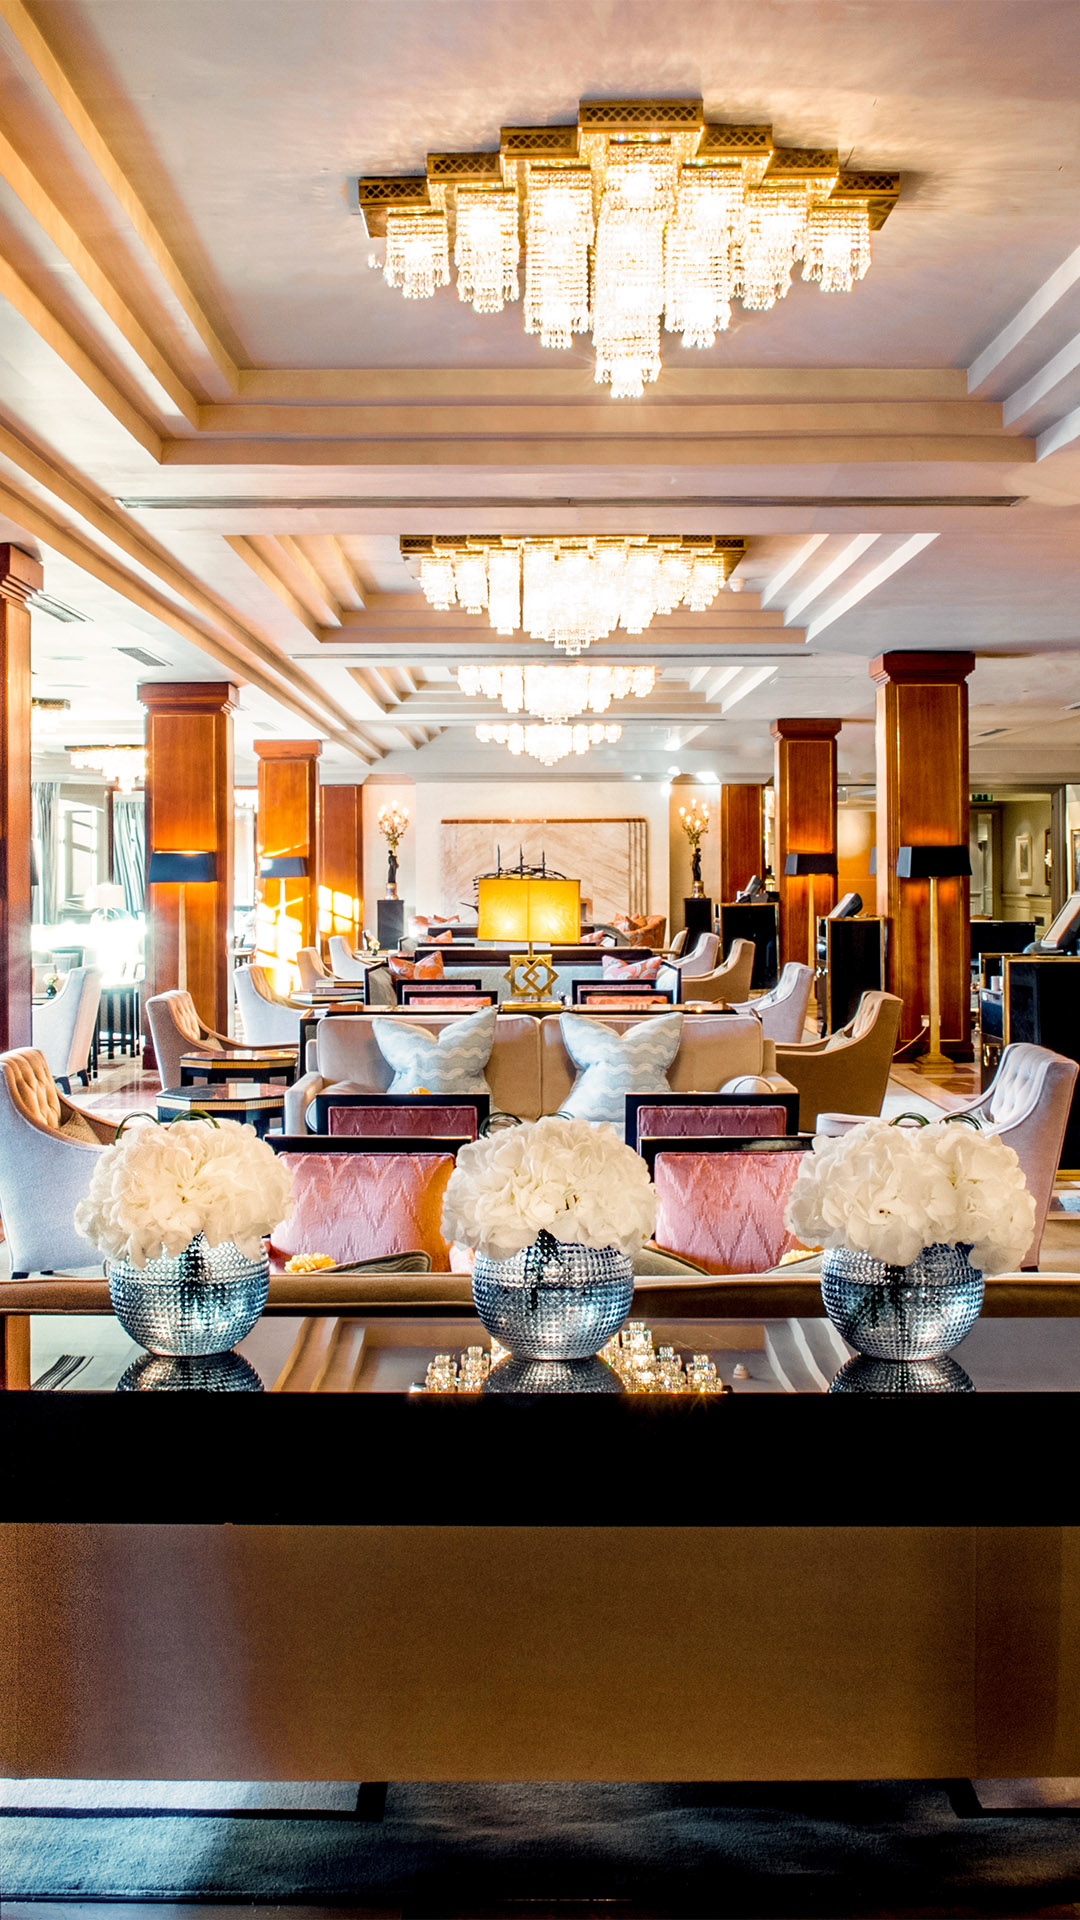 7 Star Hotel Rooms: 5 Star Hotel In Dublin City Centre